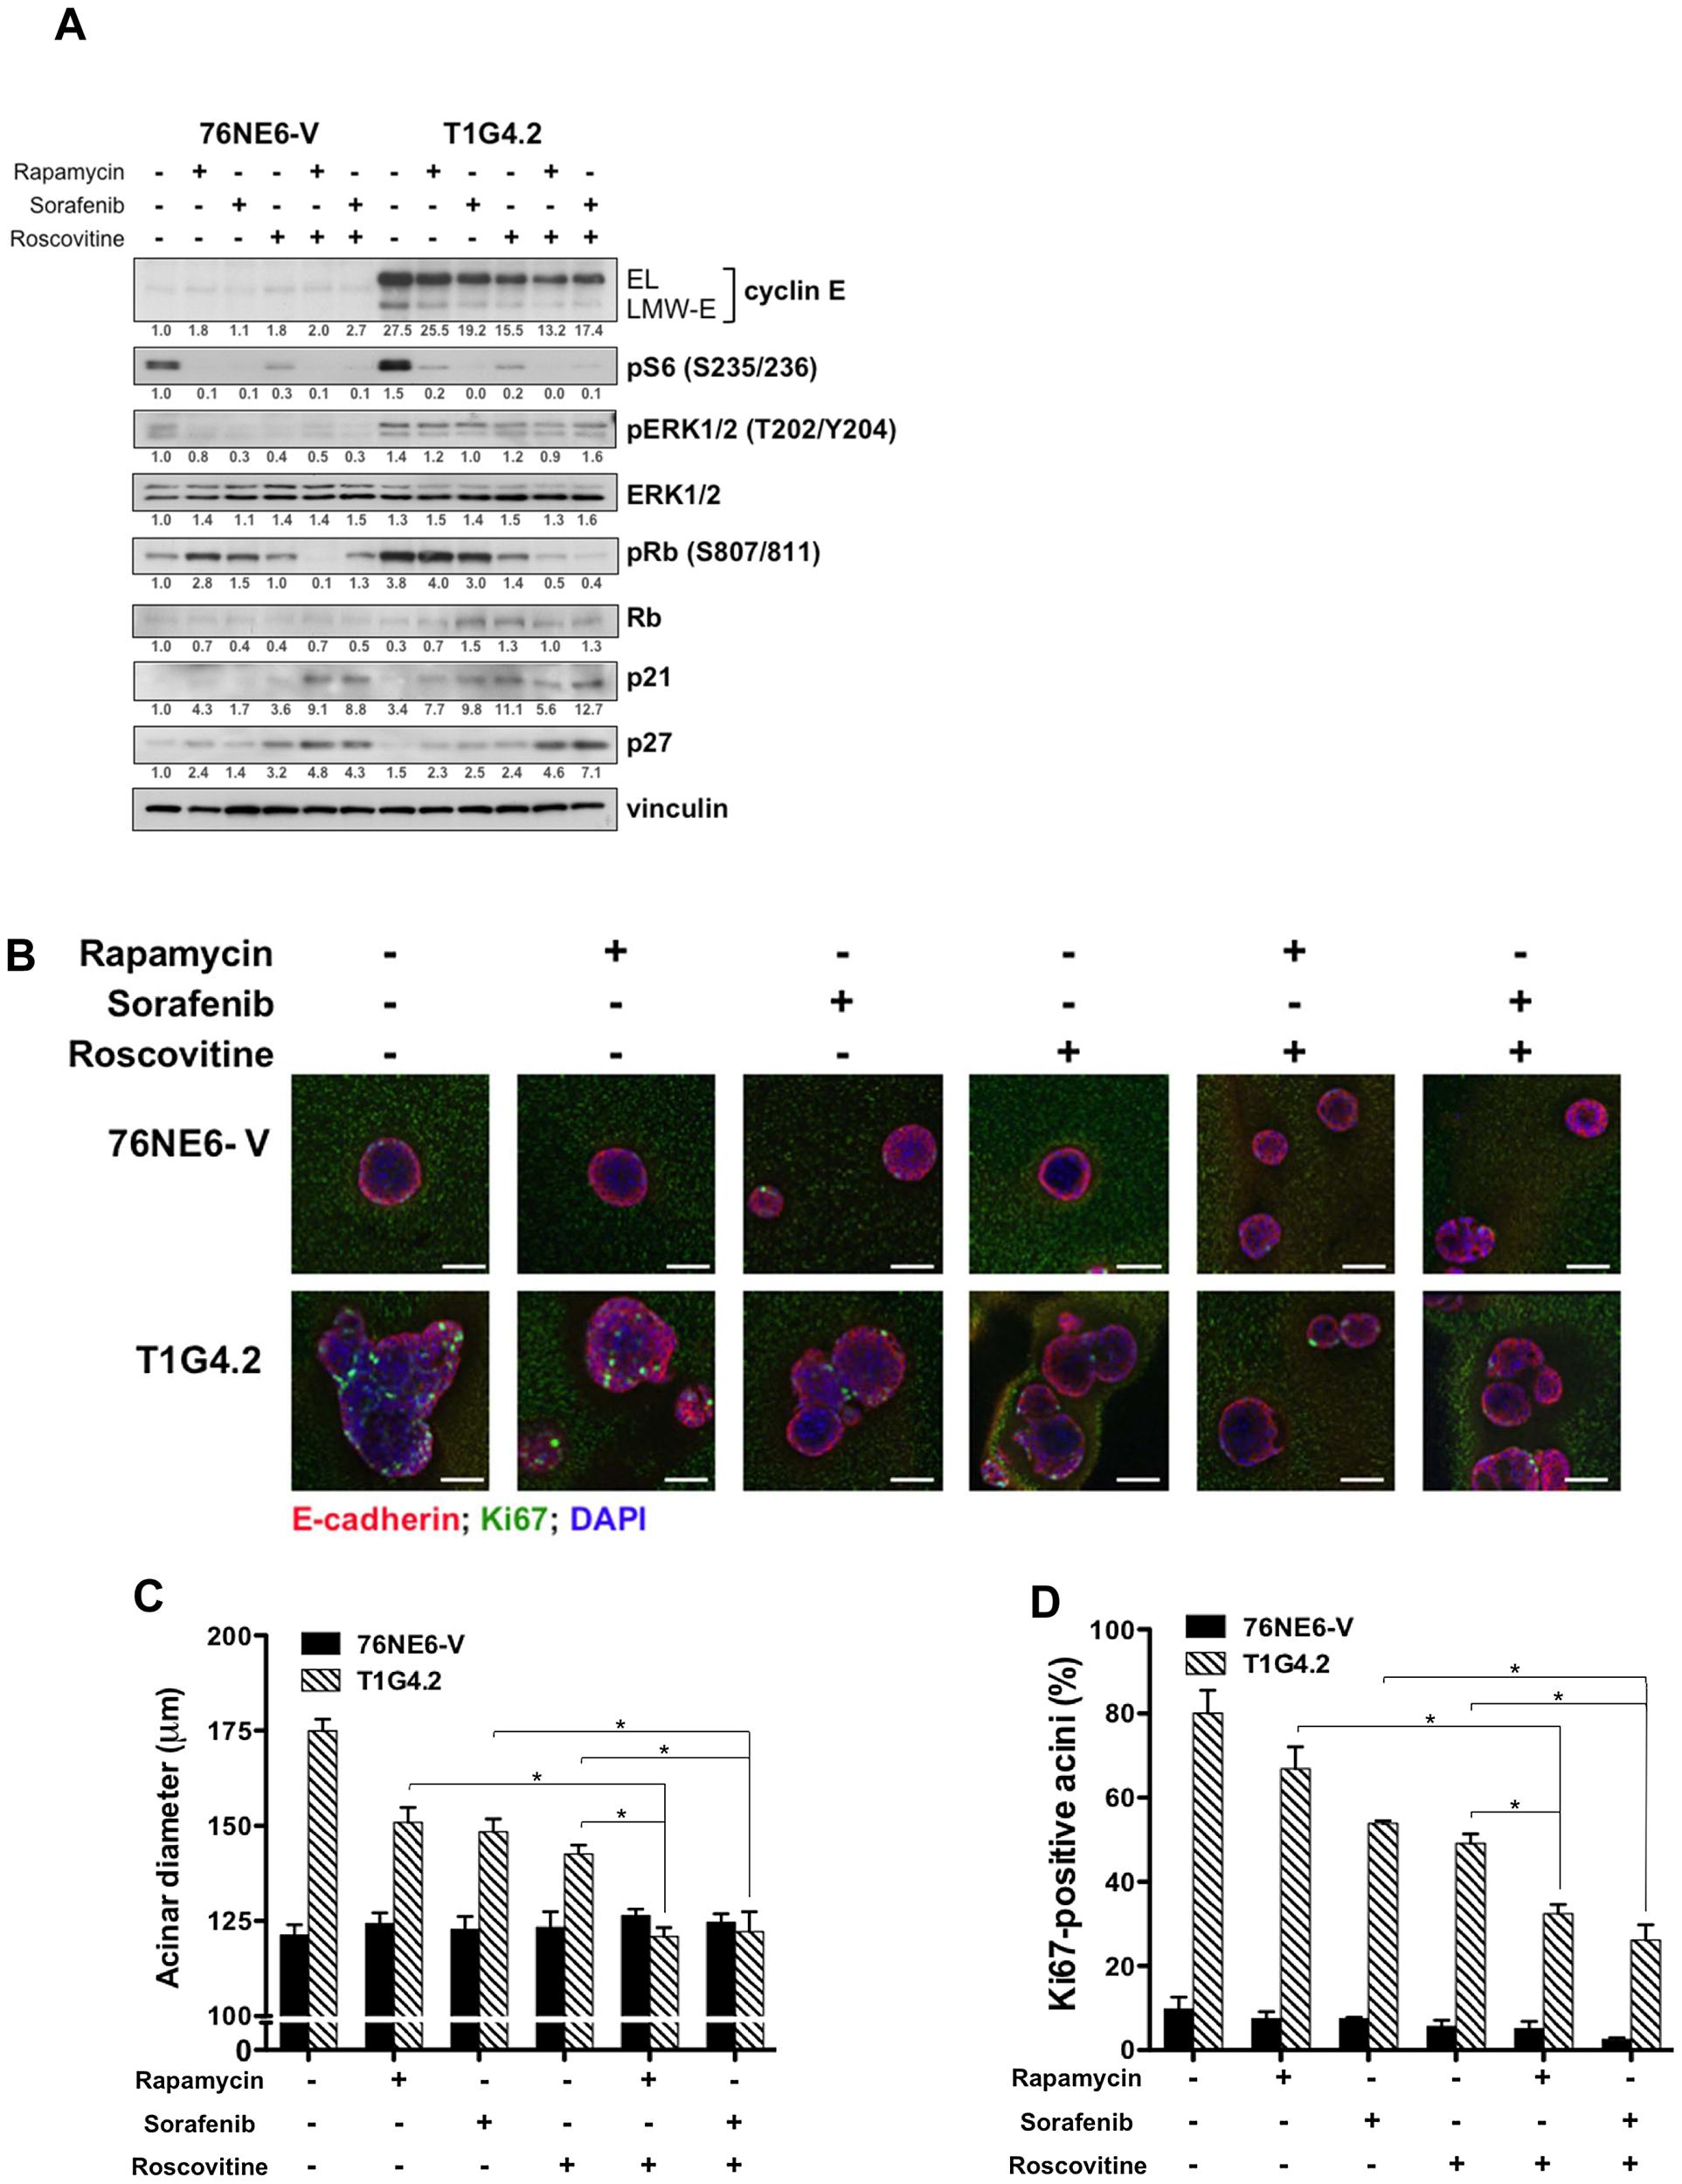 Combination drug treatment prevents induction of aberrant acinar development by LMW-E.